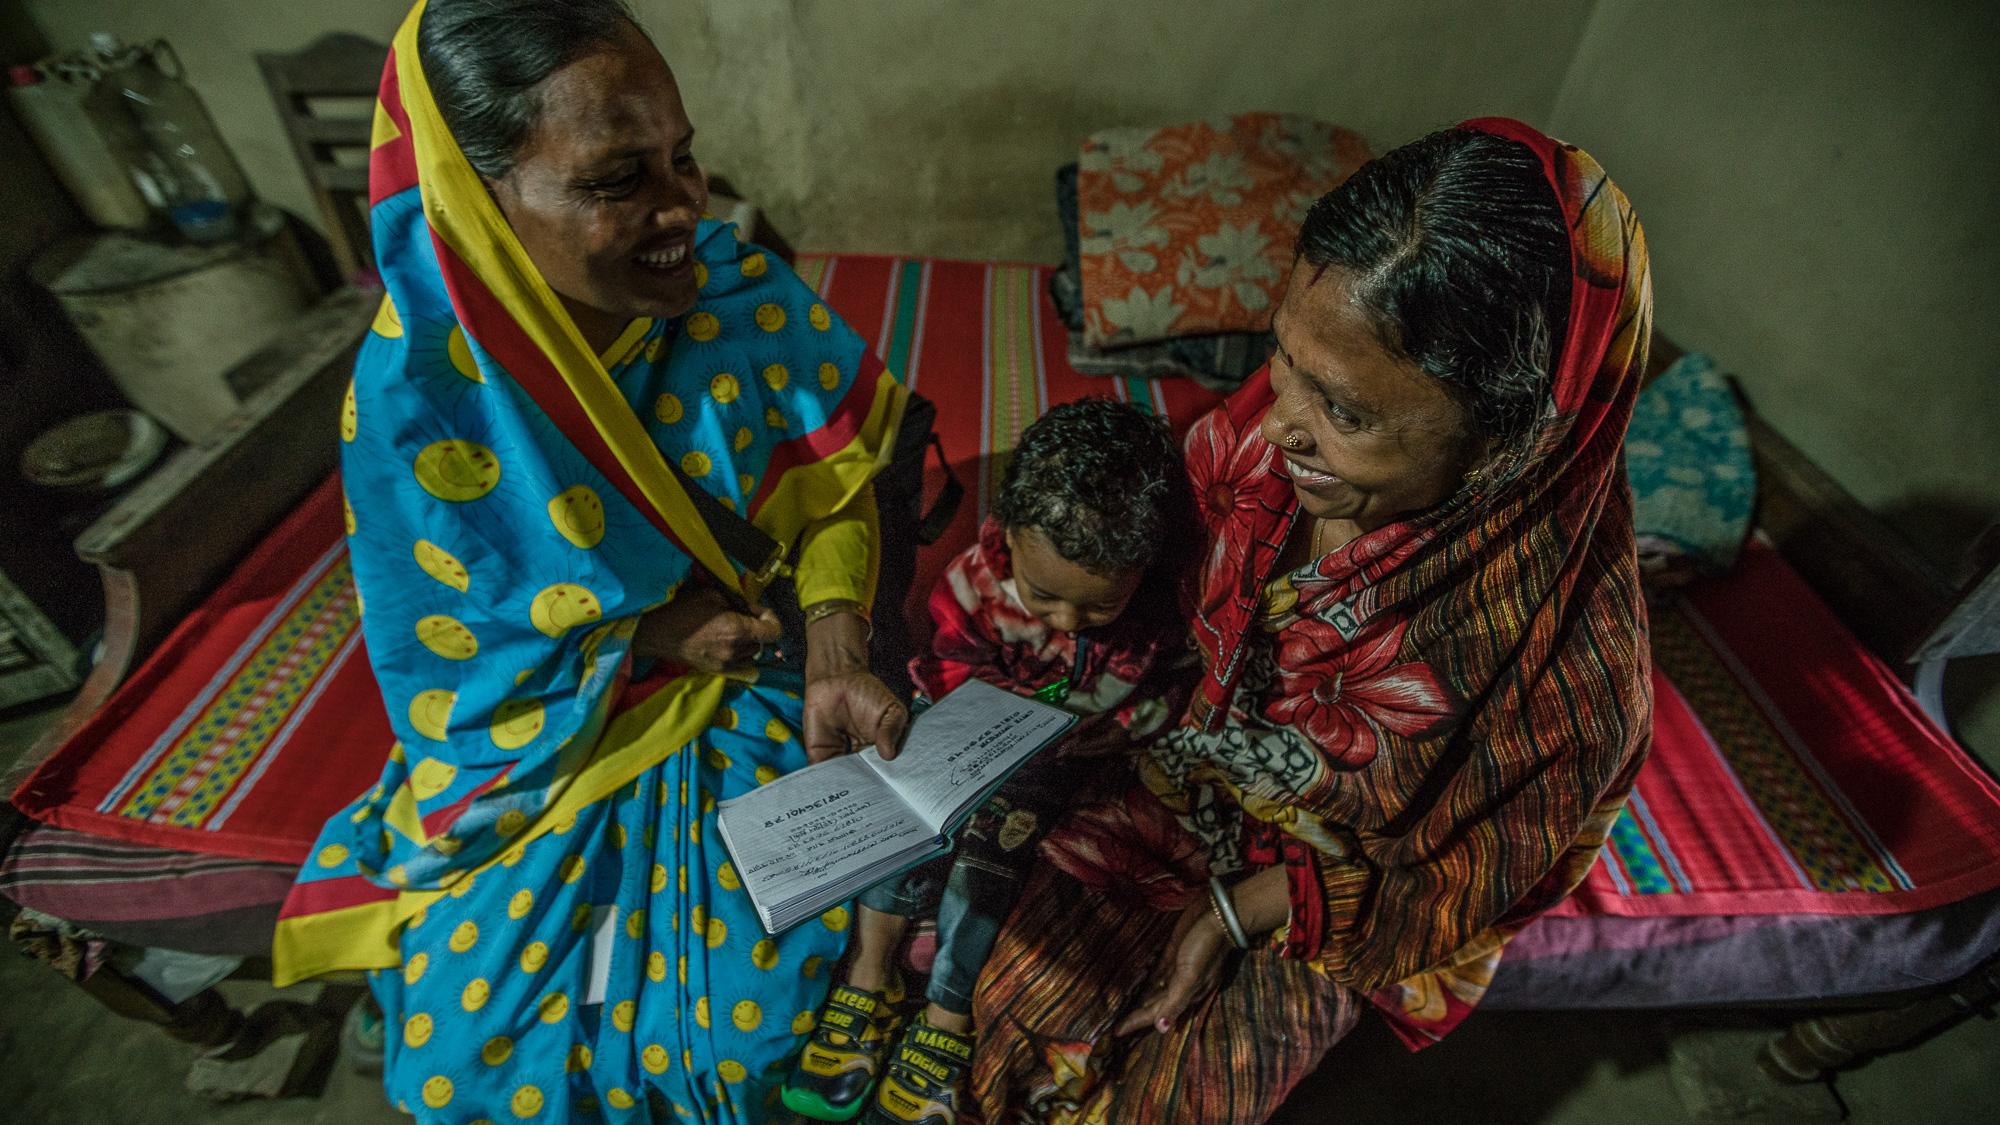 Halima Begum, a community service provider, educates Supriya Dae on child and maternal health.